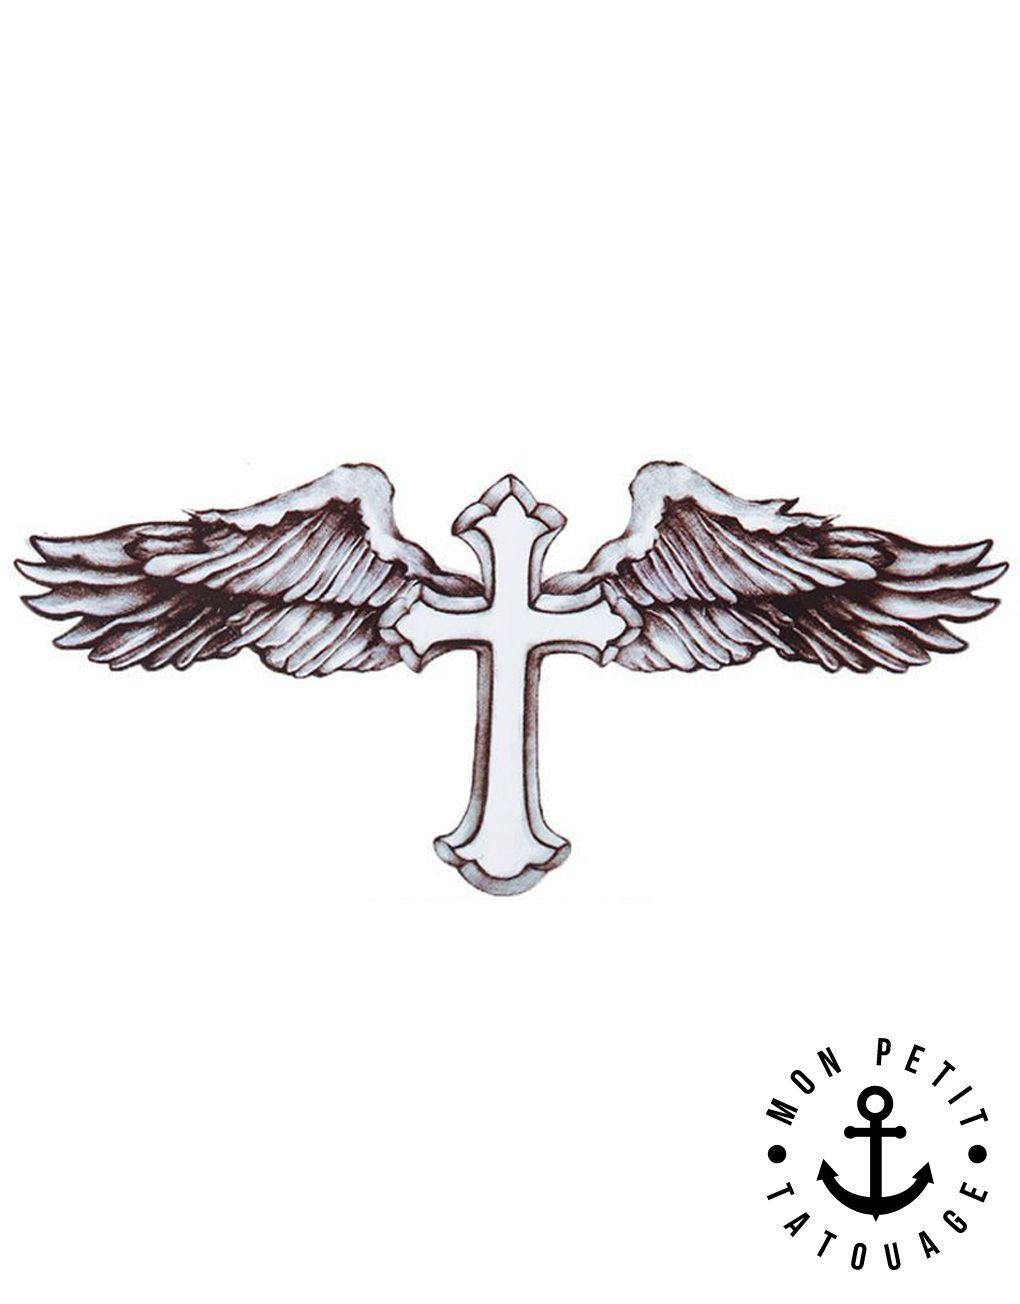 Tatouage Croix Ailes D Ange De Beckham Tatouage Croix Tatouage